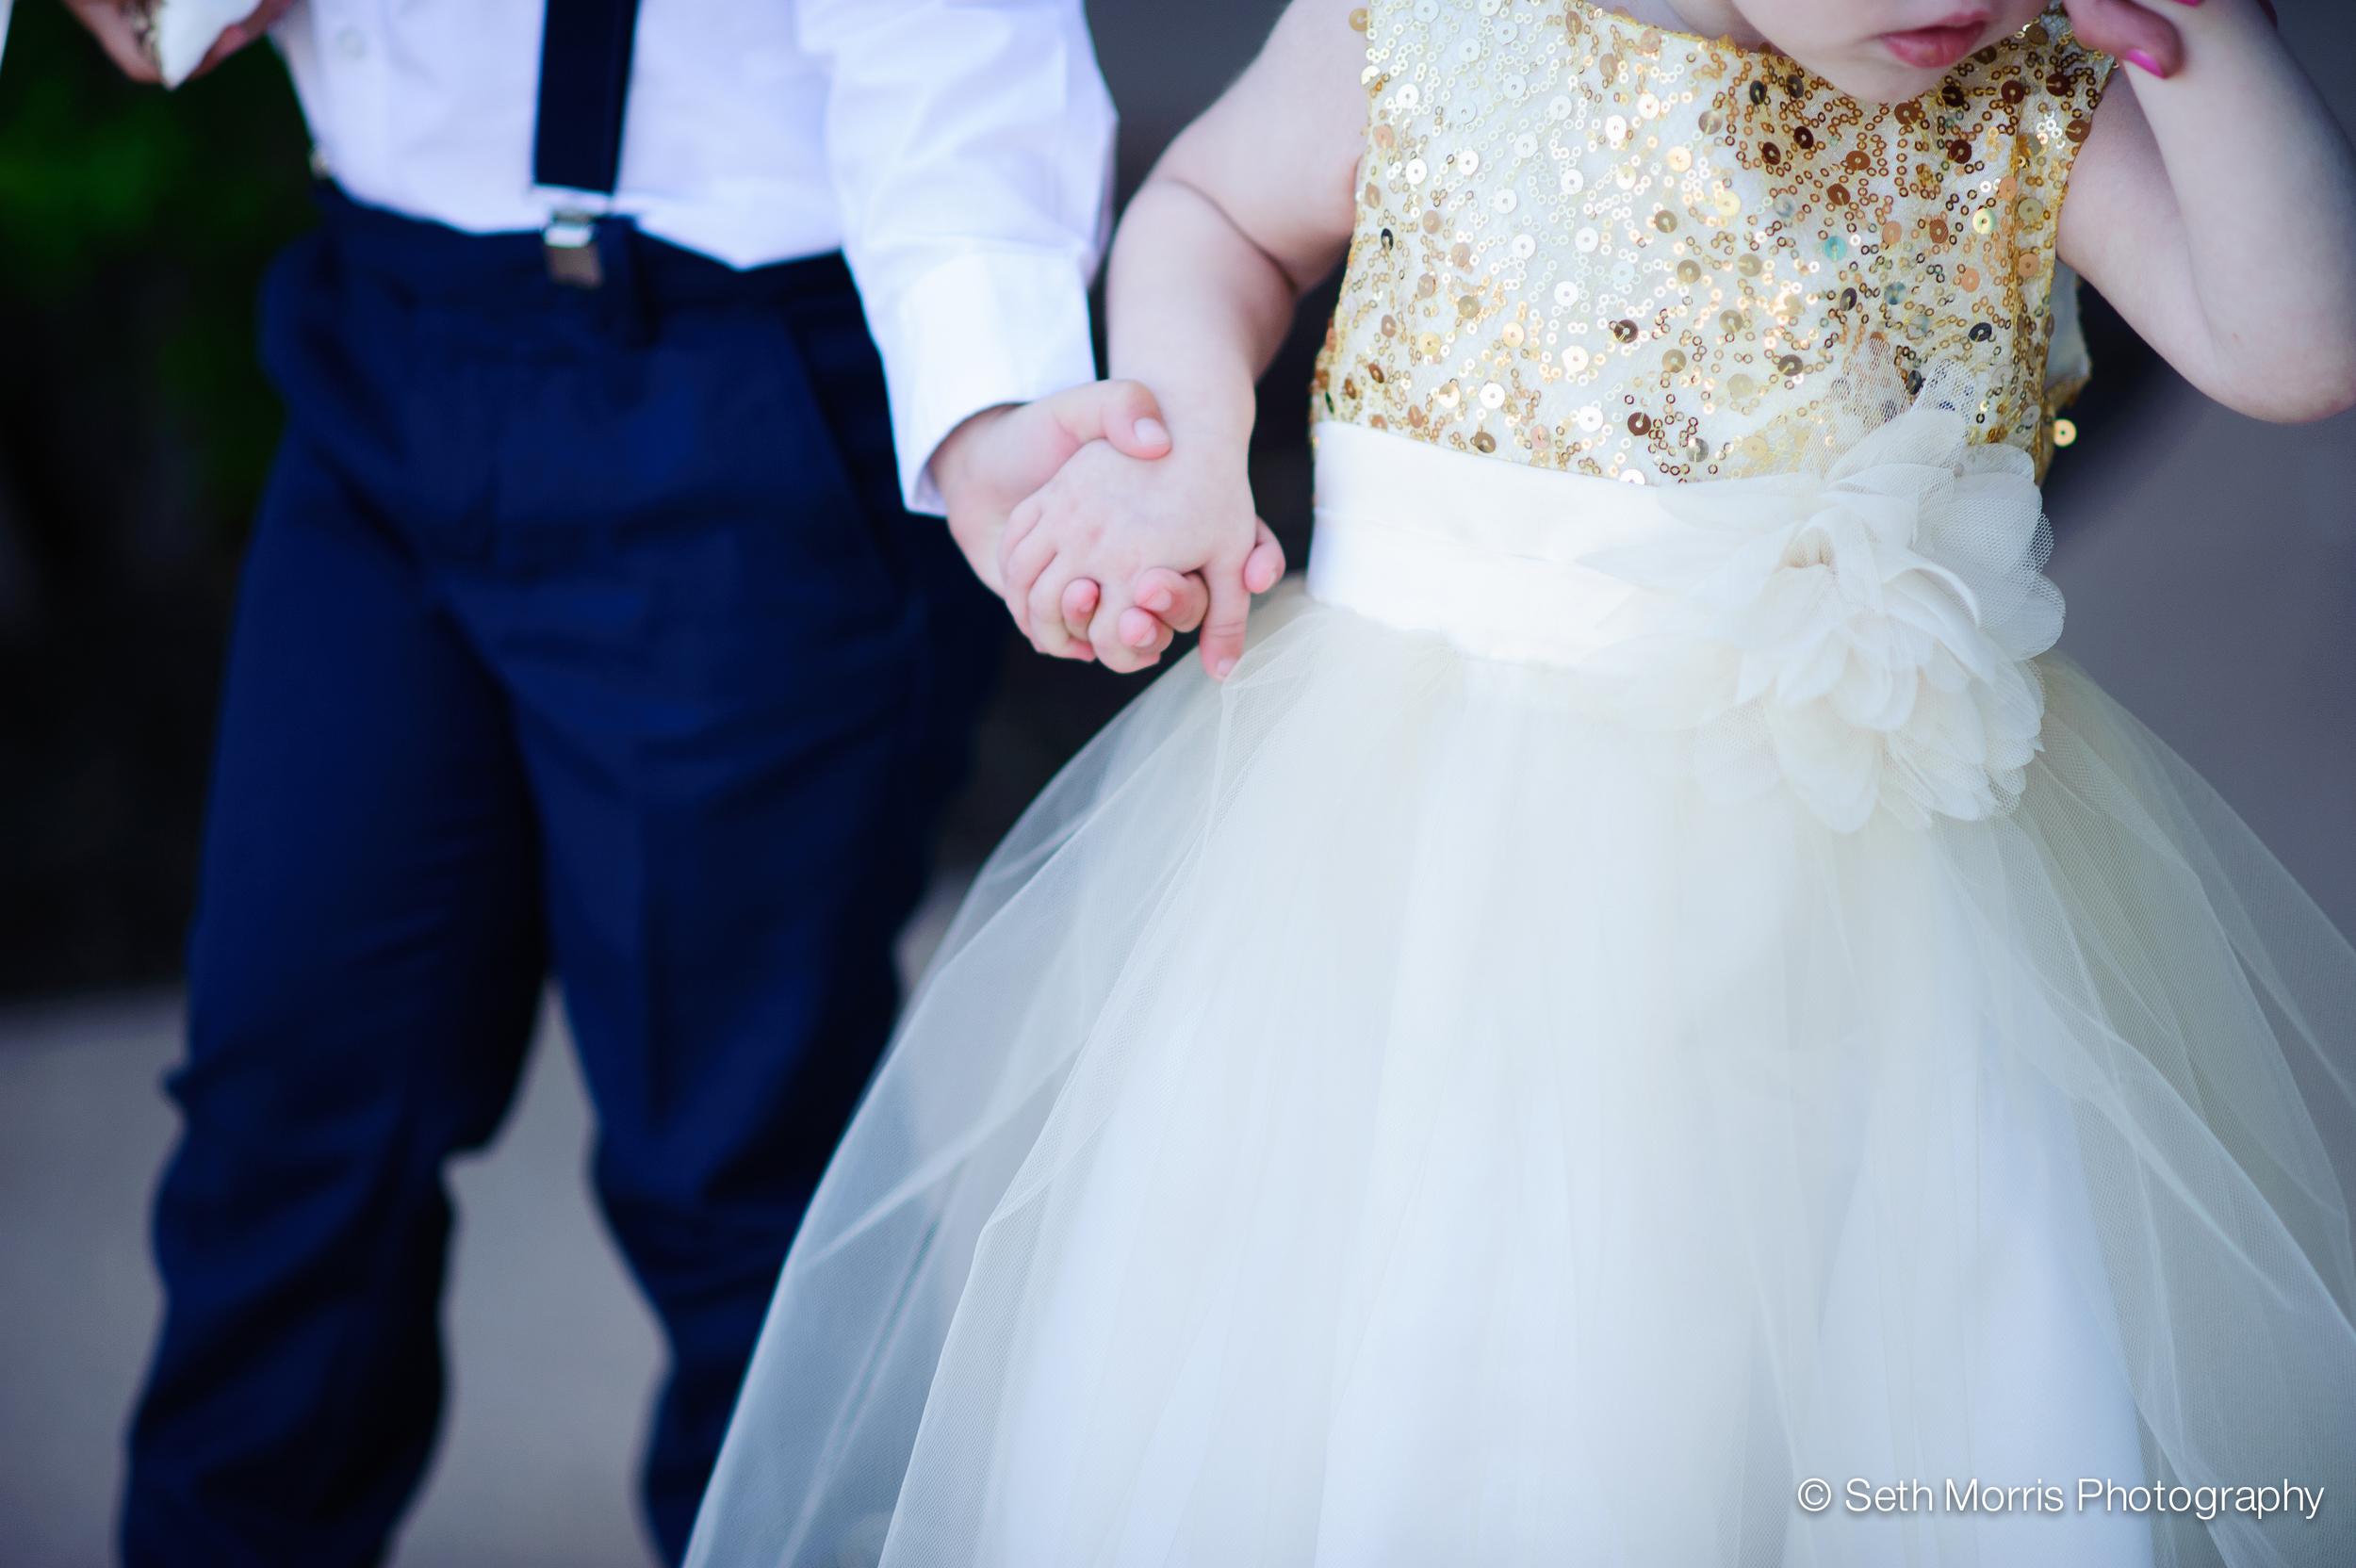 metamora-fields-wedding-photographer-peoria-162.jpg